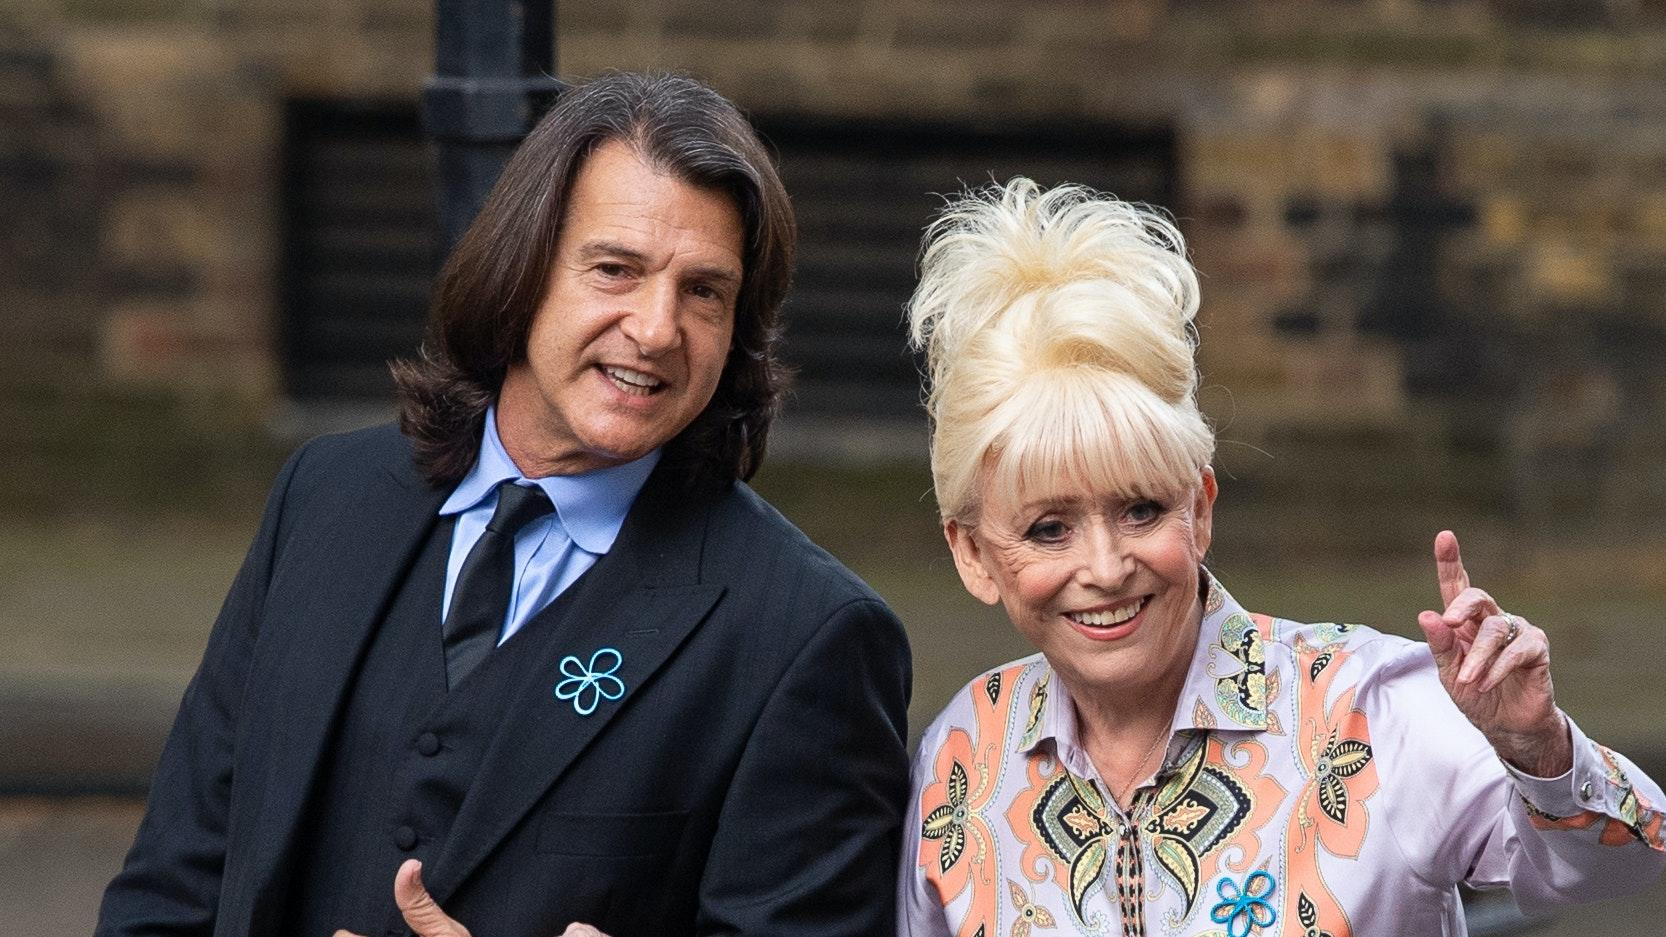 Dame Barbara Windsors husband says she may have to go